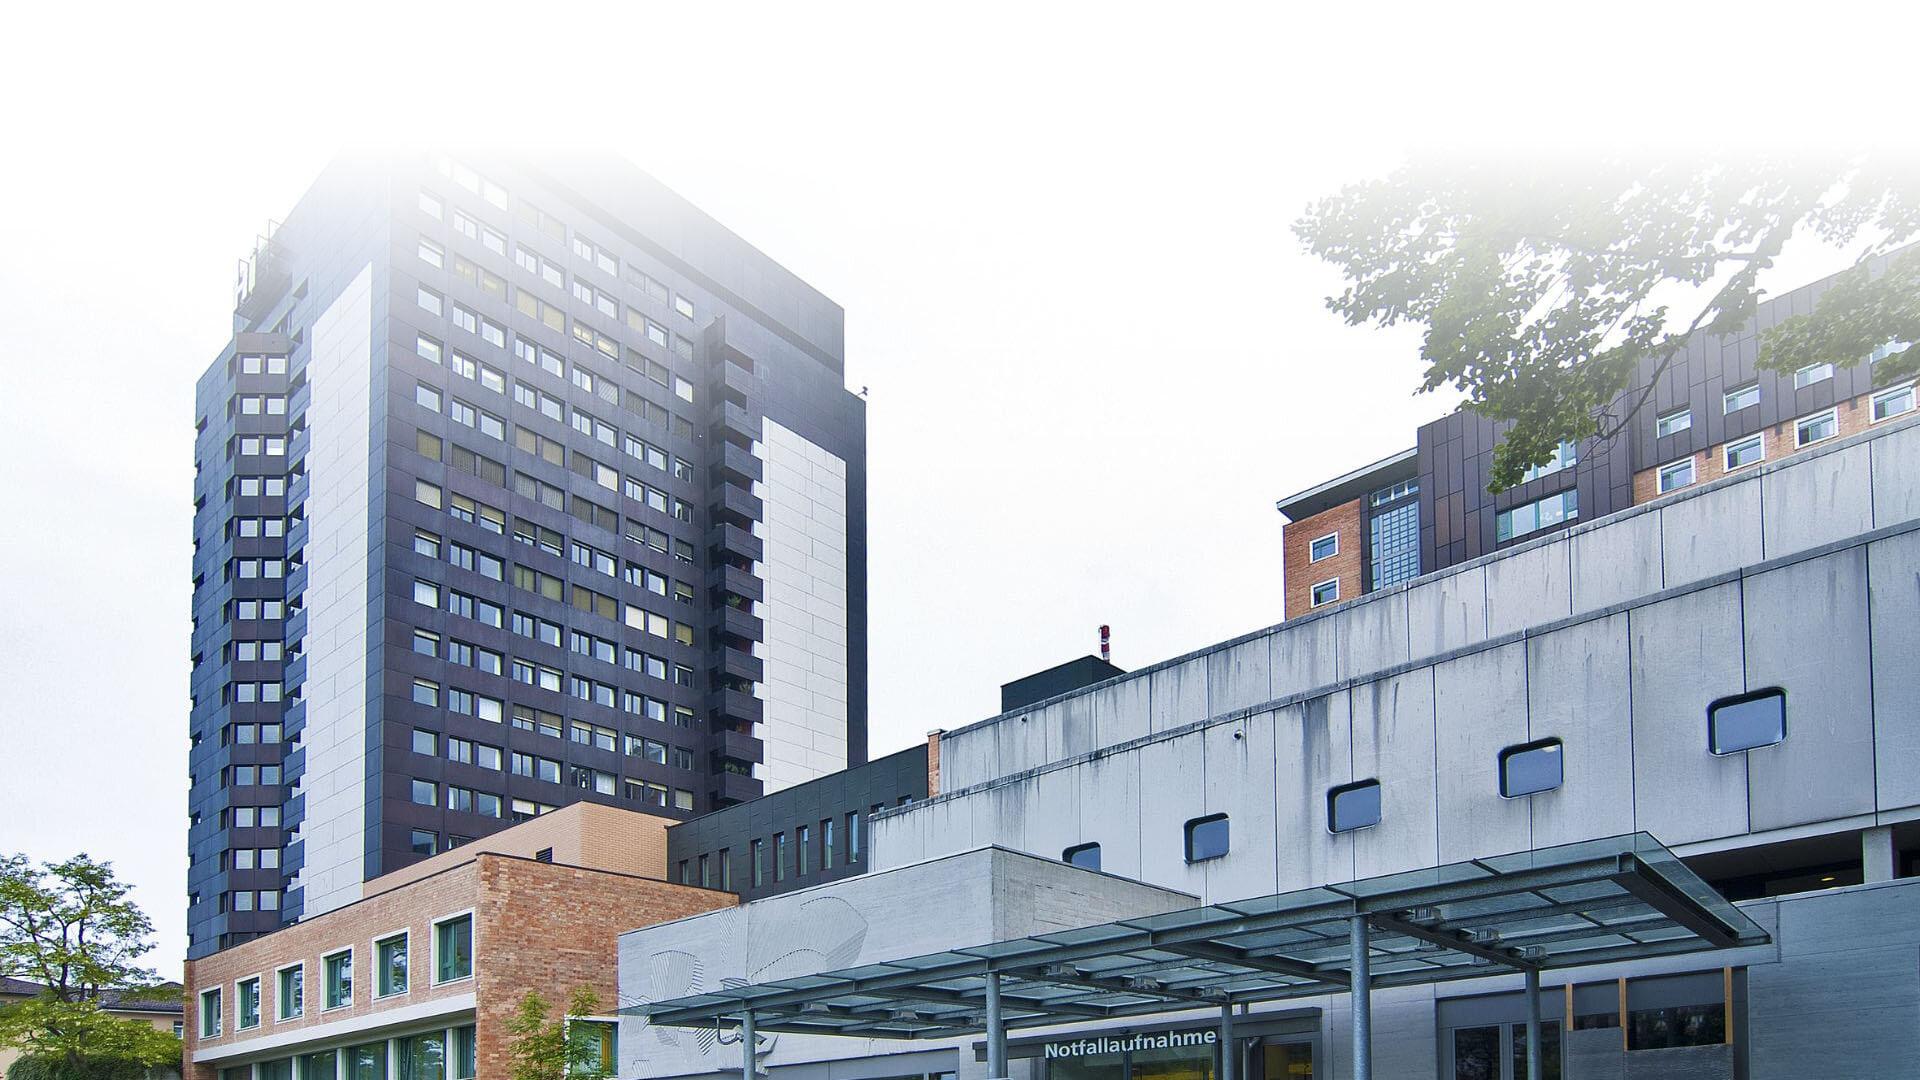 Hospital St-Gallen